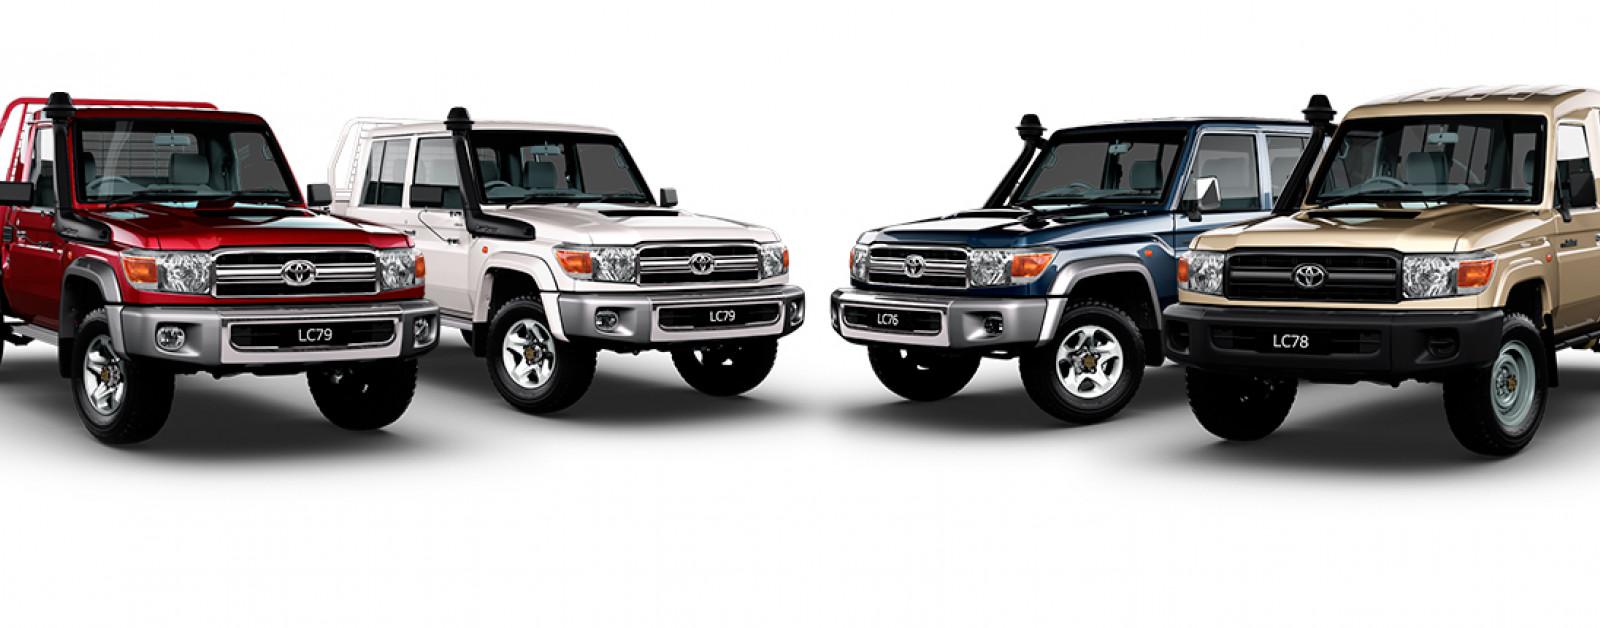 New Toyota LandCruiser 70 for sale - Cessnock Toyota